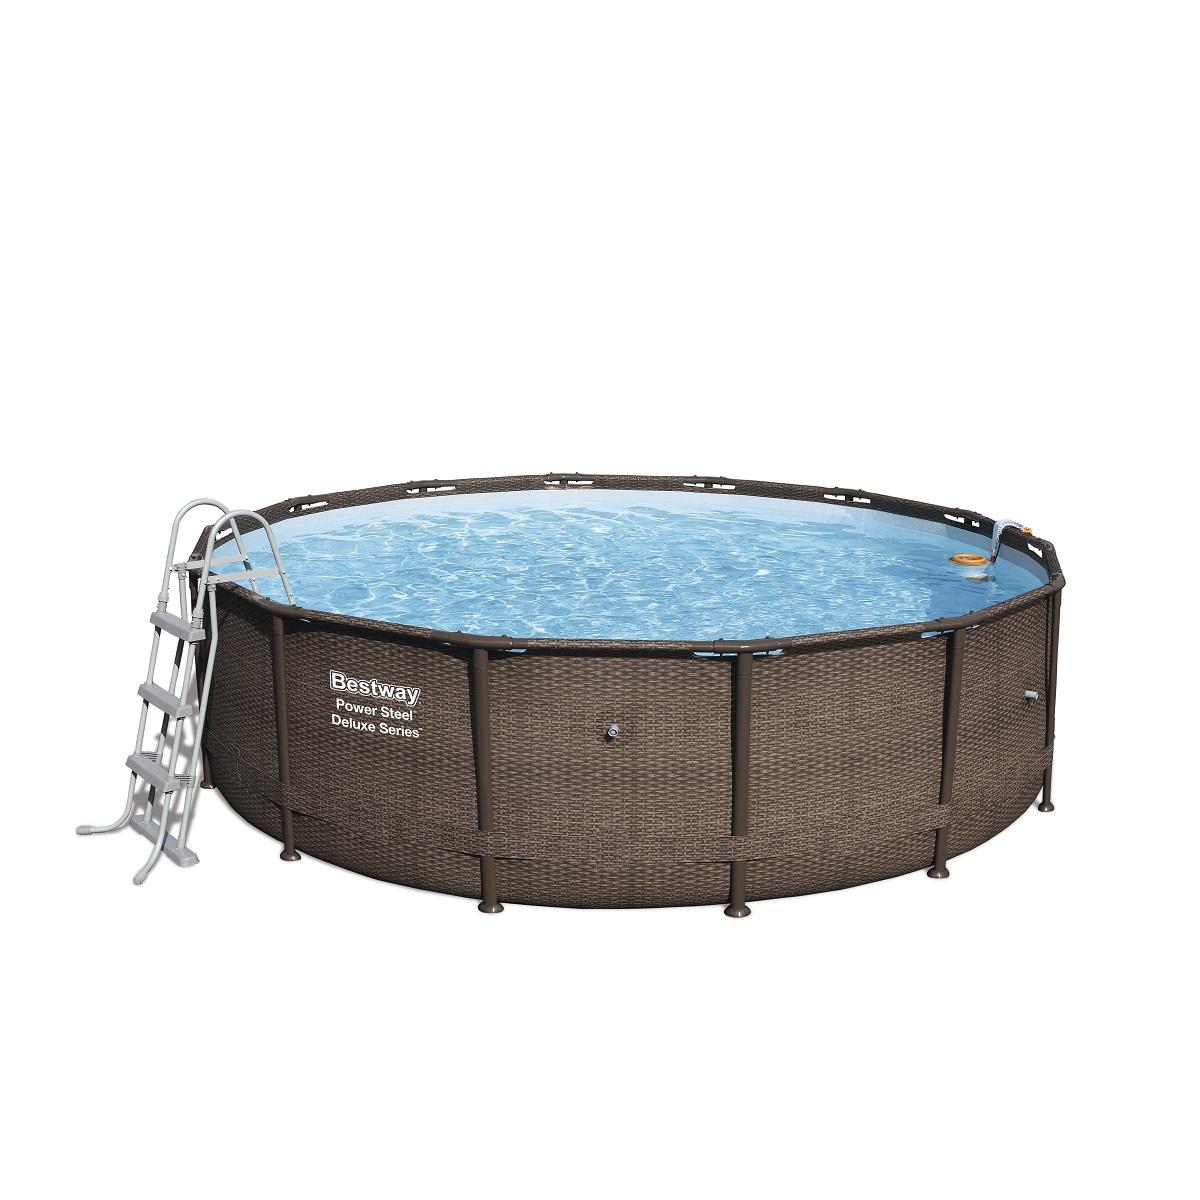 Bazén BESTWAY Power Steel Deluxe 427 x 107 cm set s filtráciou - hnedý